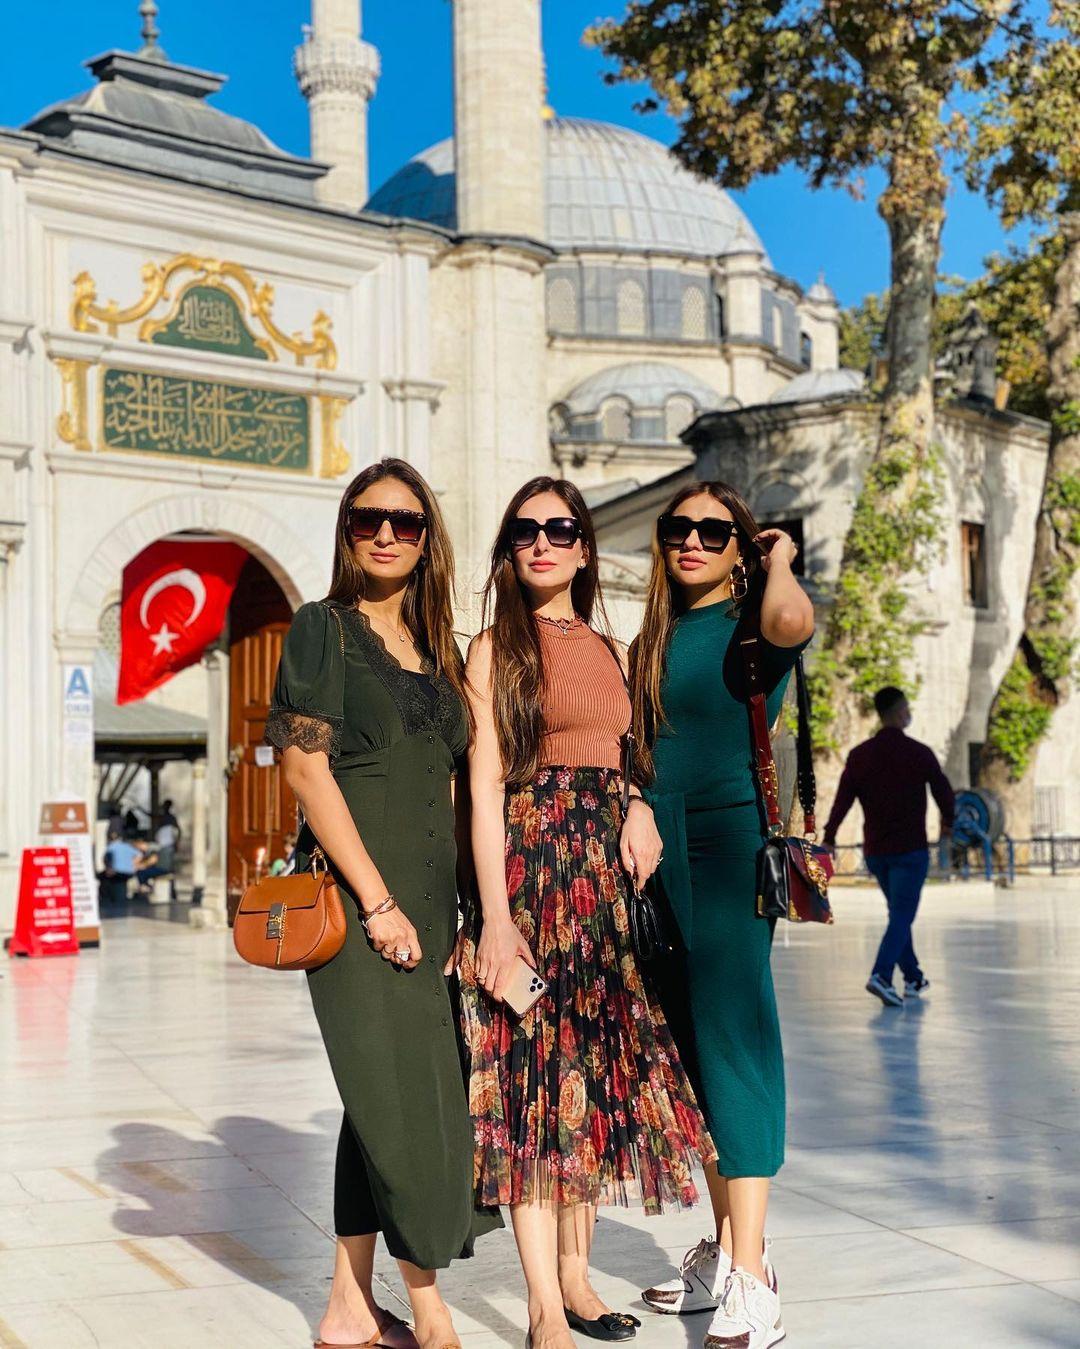 Pakistani Celebrities Enjoying Vacations in Turkey - Beautiful Pictures